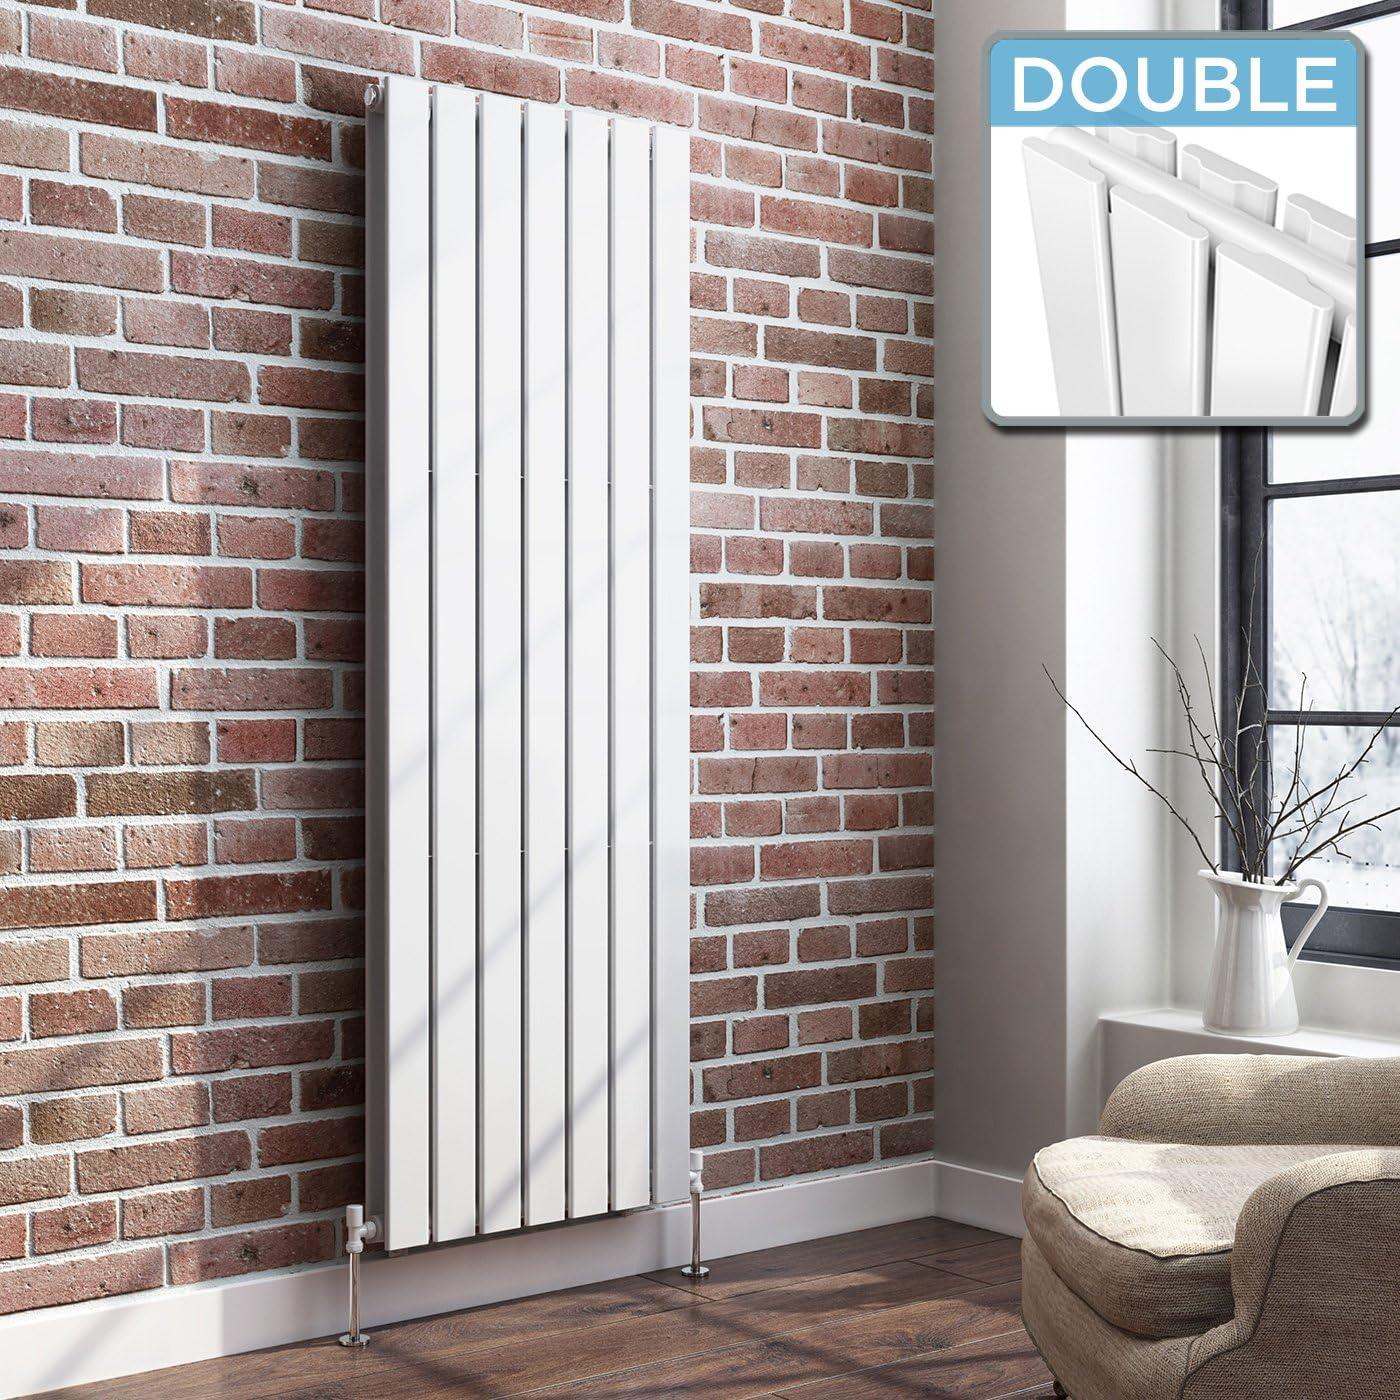 iBathUK | 1600 x 532 Vertical Column Designer Radiator White Gloss Double Flat Panel